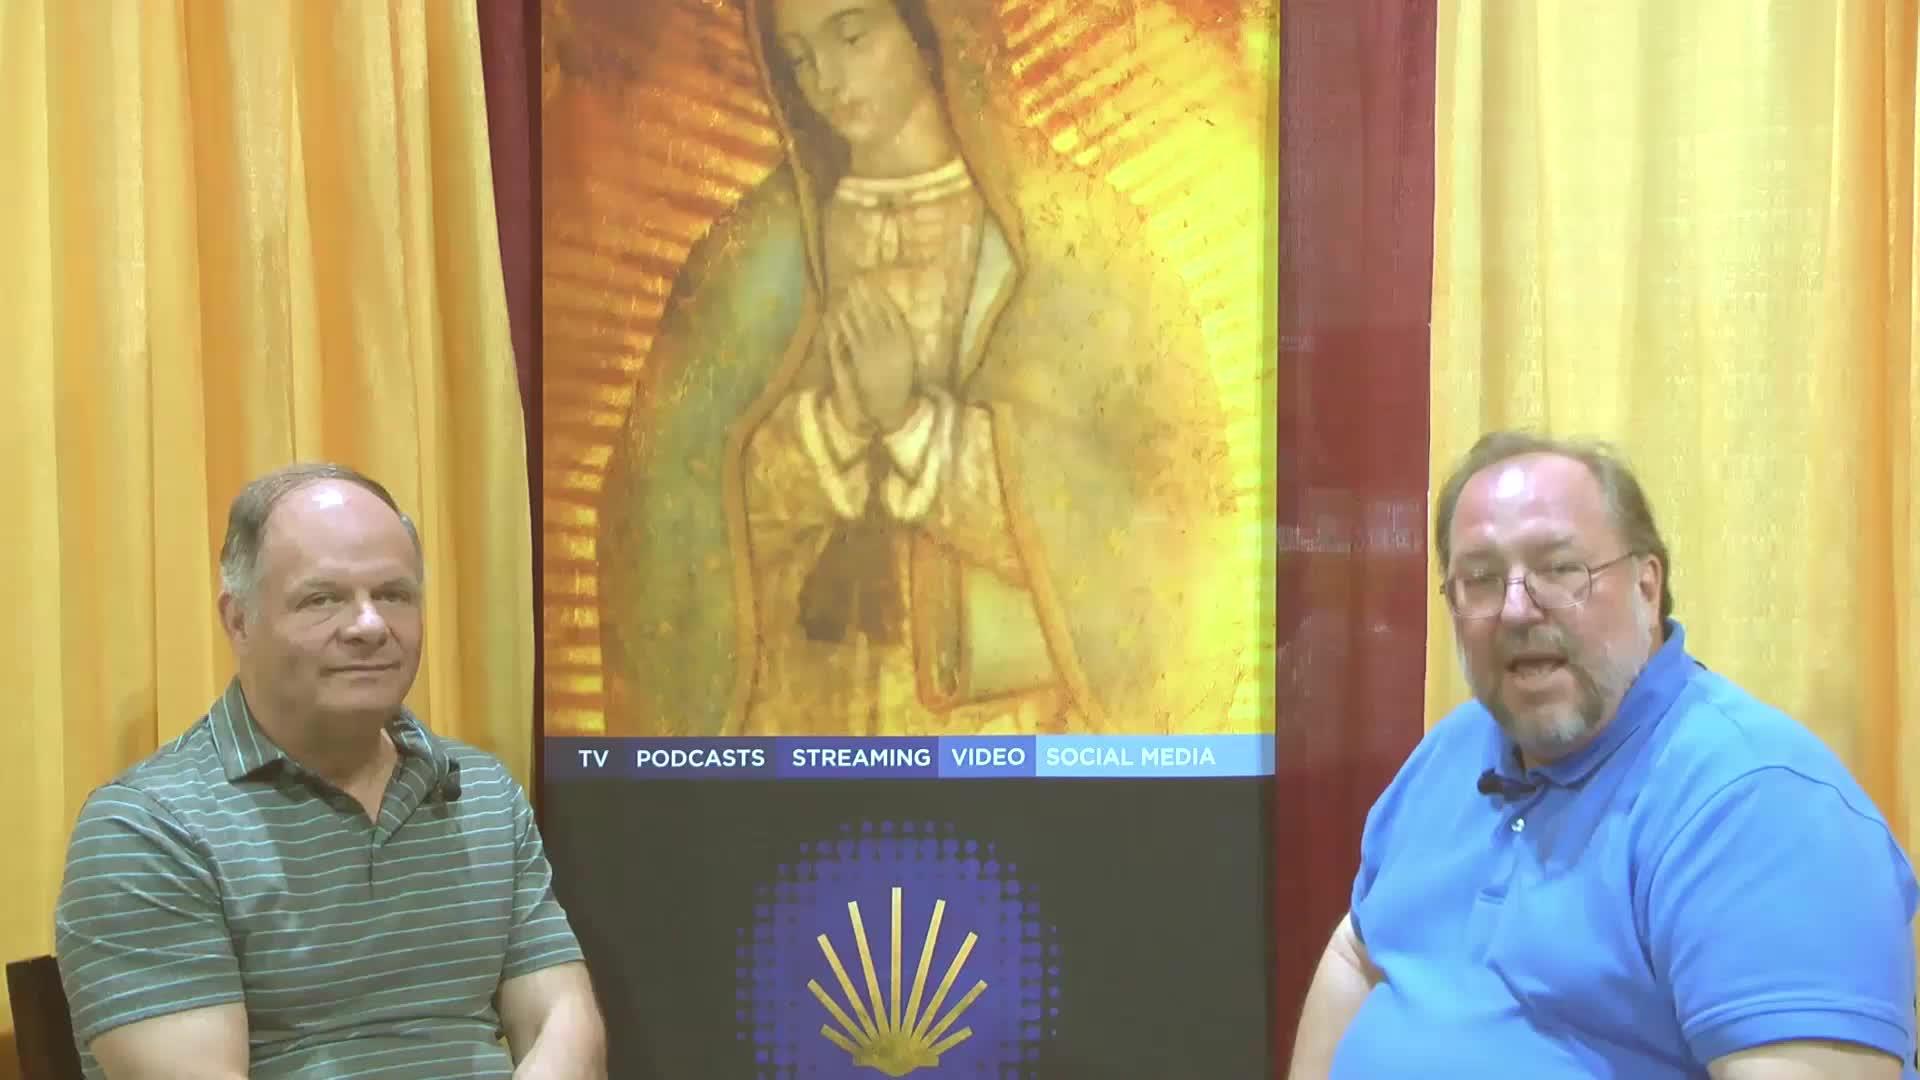 Consequences of Ignoring Humanae Vitae